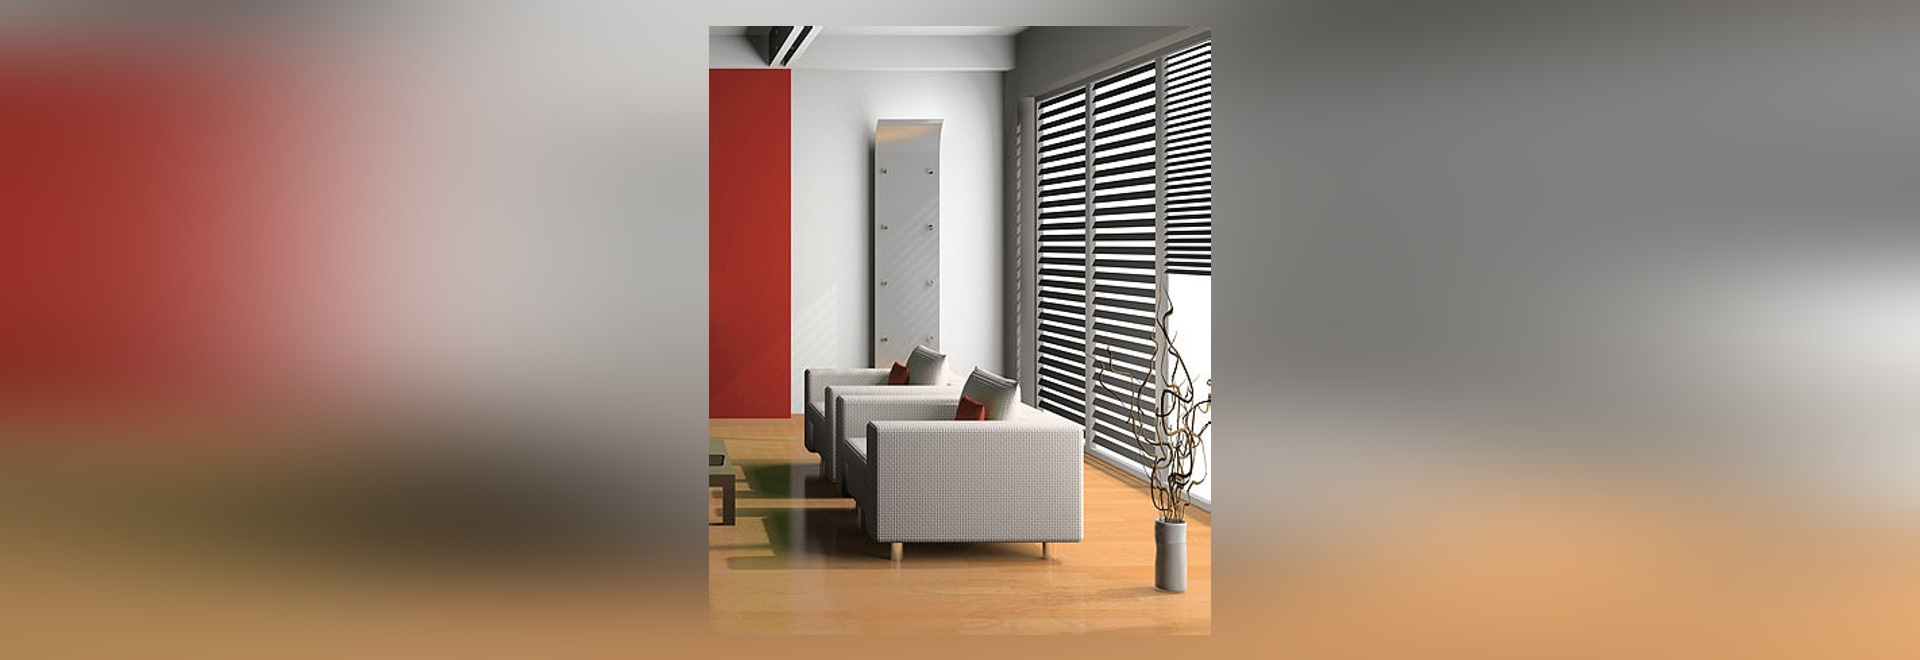 NEW: Venetian blinds by CTA Australia